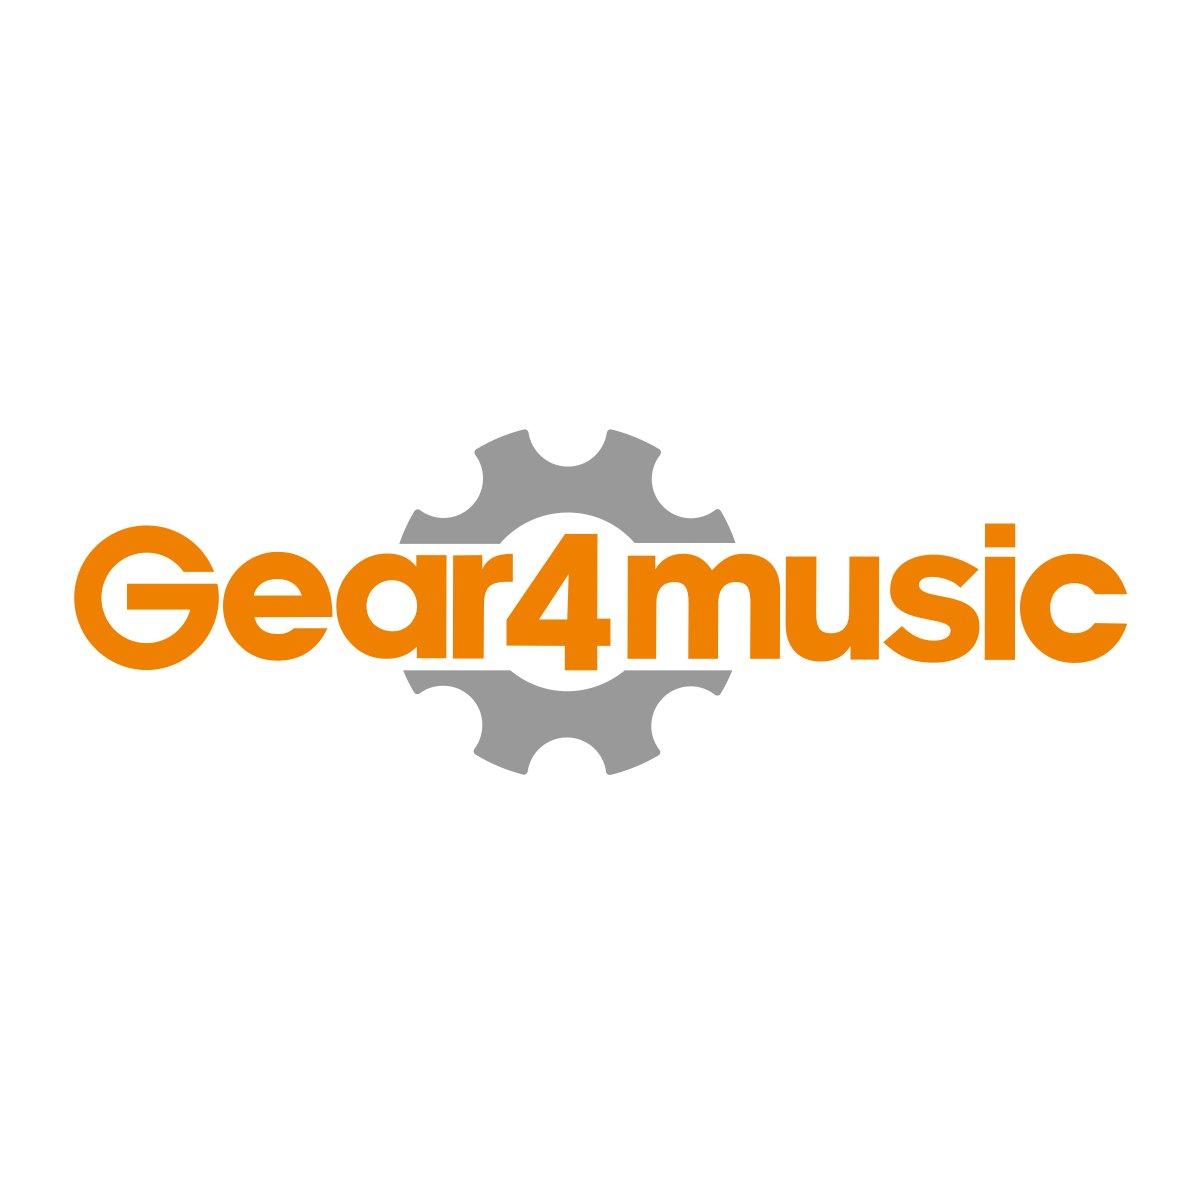 electric guitars guitar shop gear4music. Black Bedroom Furniture Sets. Home Design Ideas